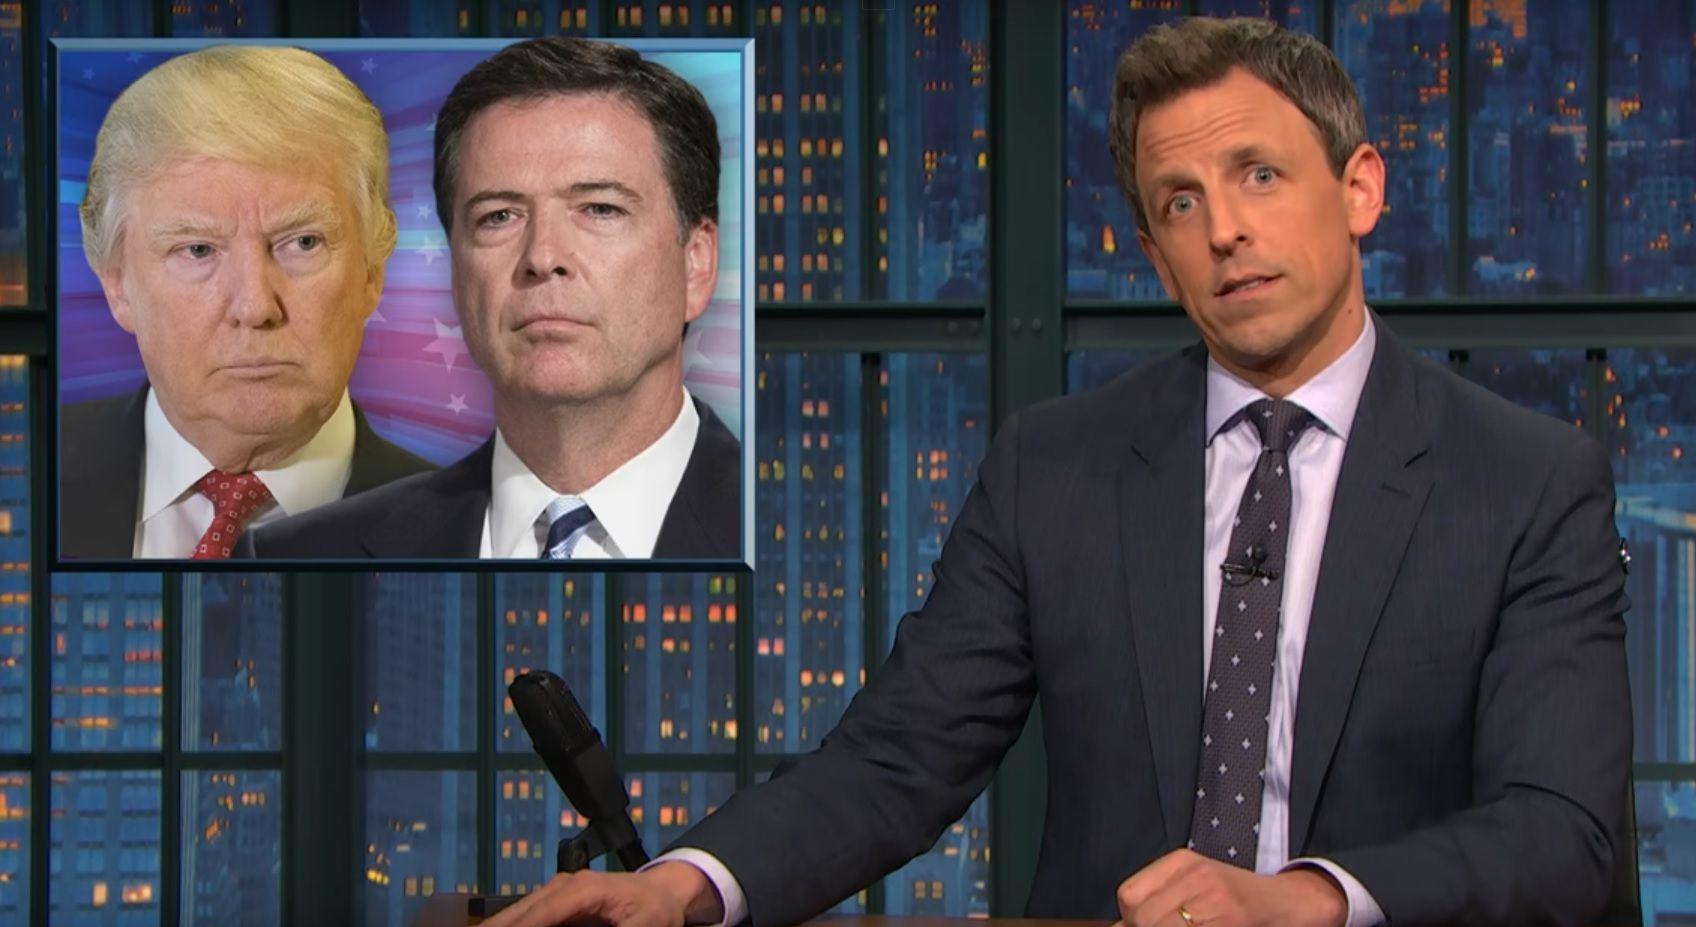 Seth Meyers on Donald Trump and James Comey